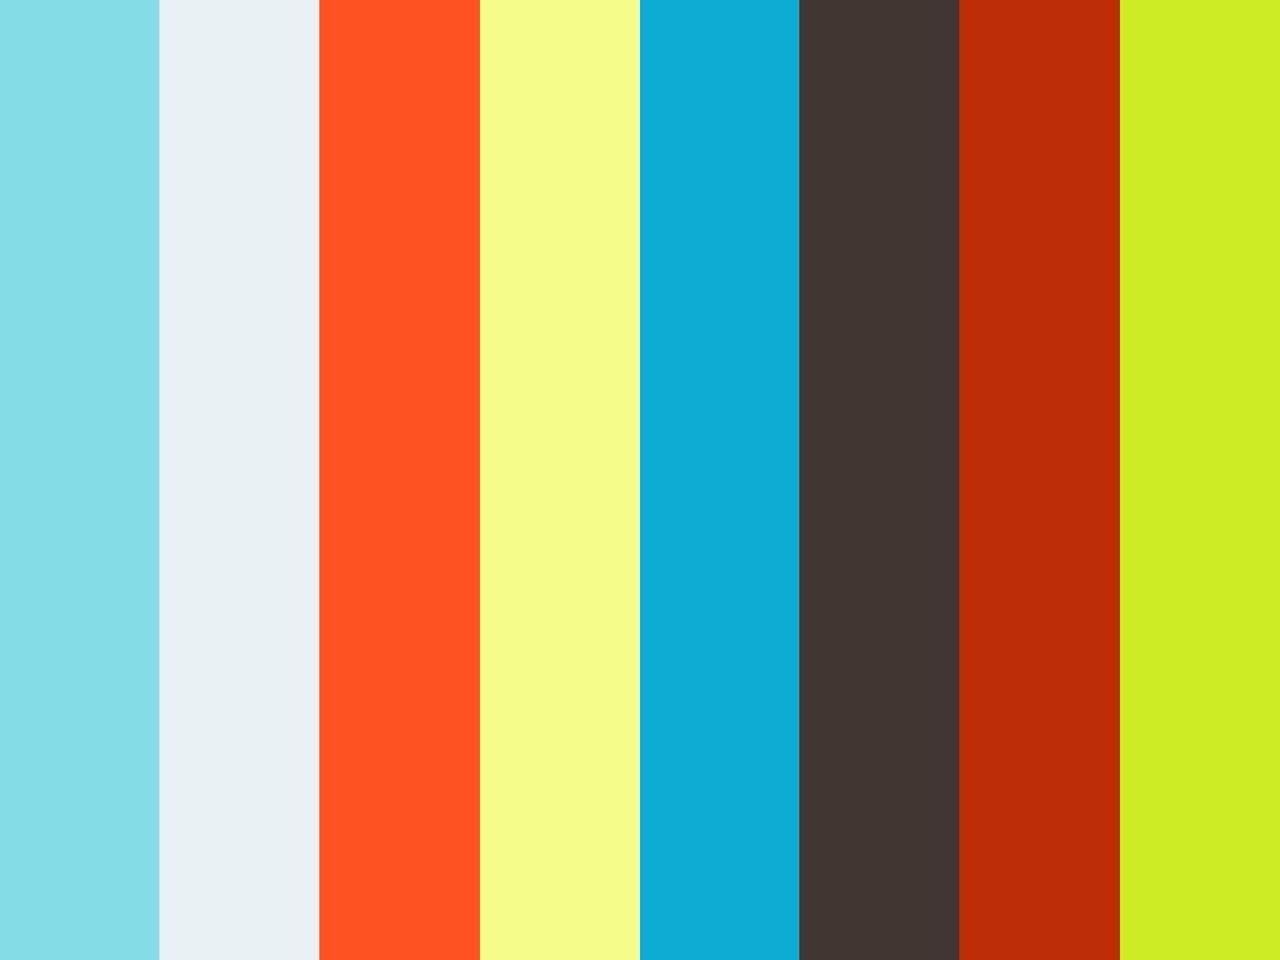 51371 - Solitaire Bead Set Shoulders